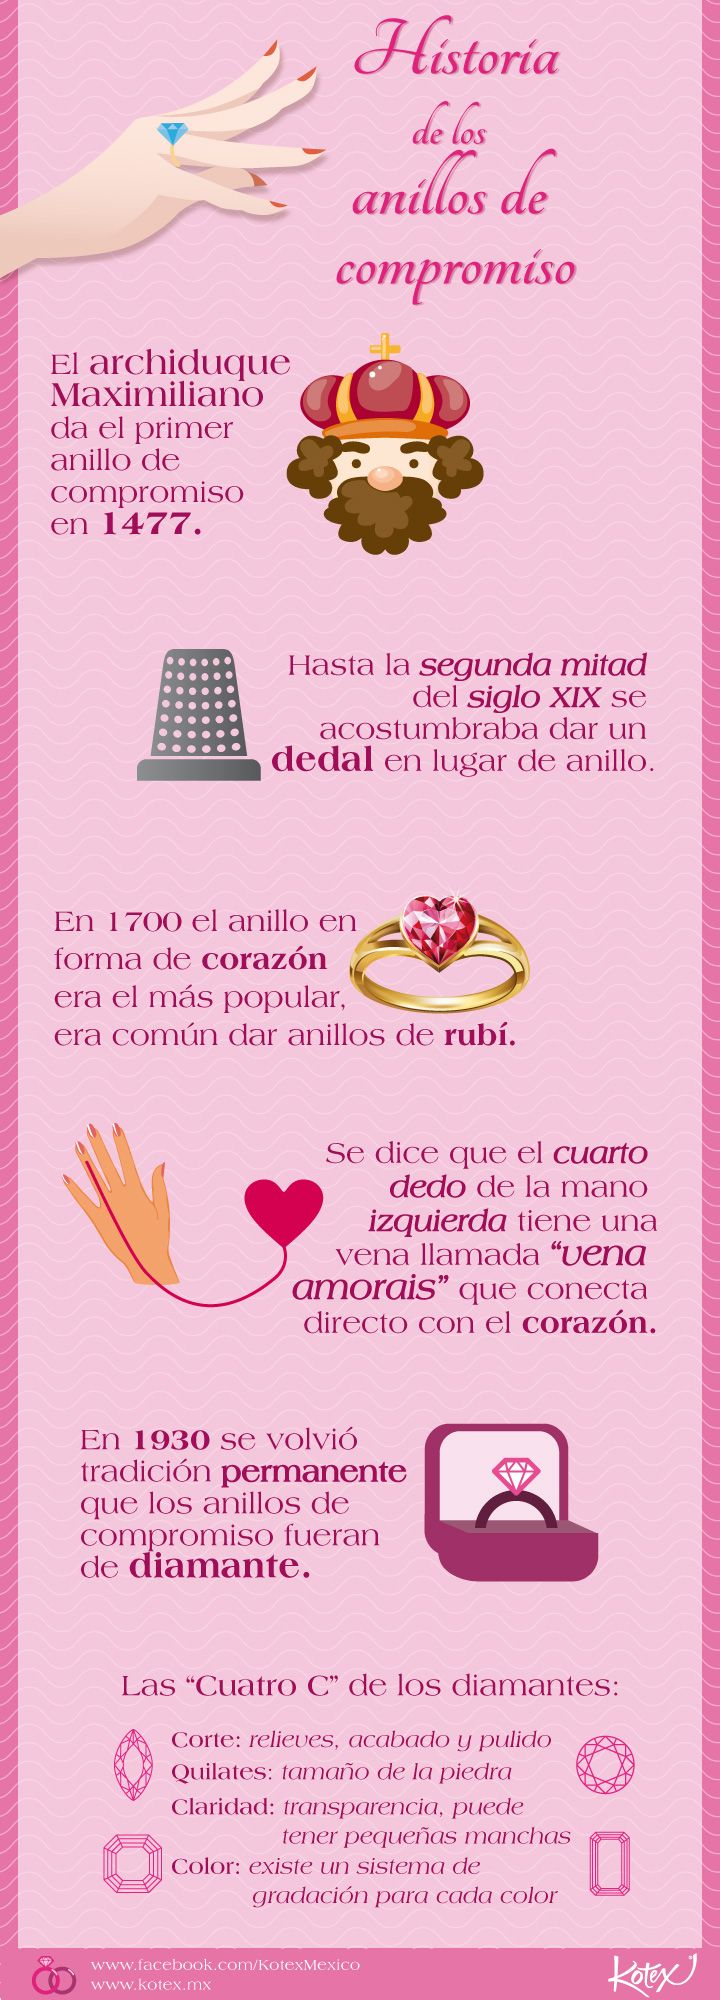 historia_anillos_compromiso_info.jpg (720×2000)